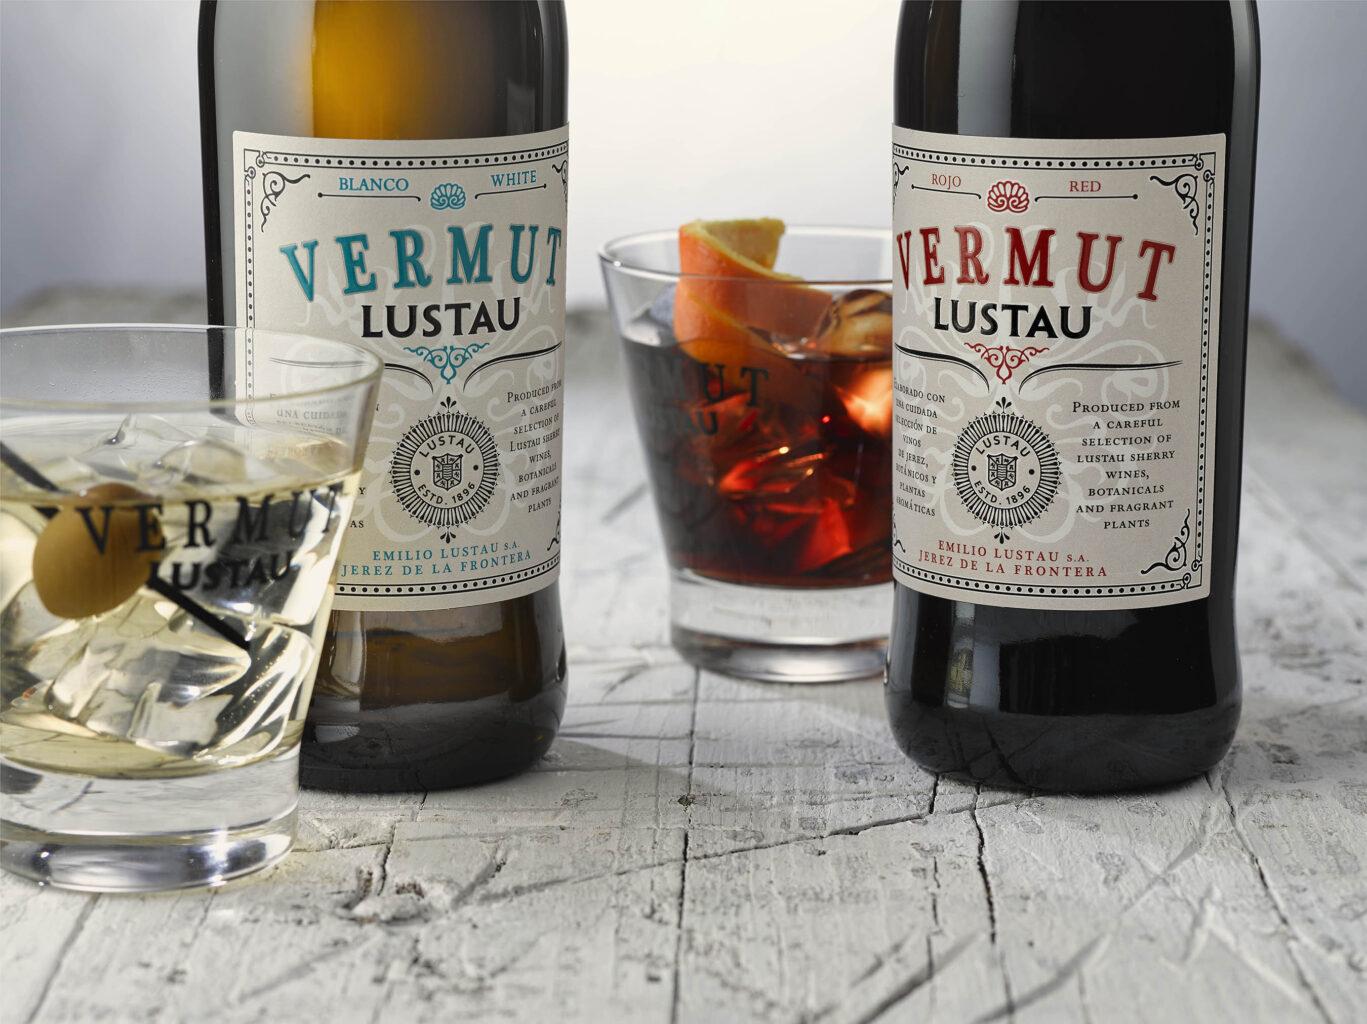 Vermuts Lustau